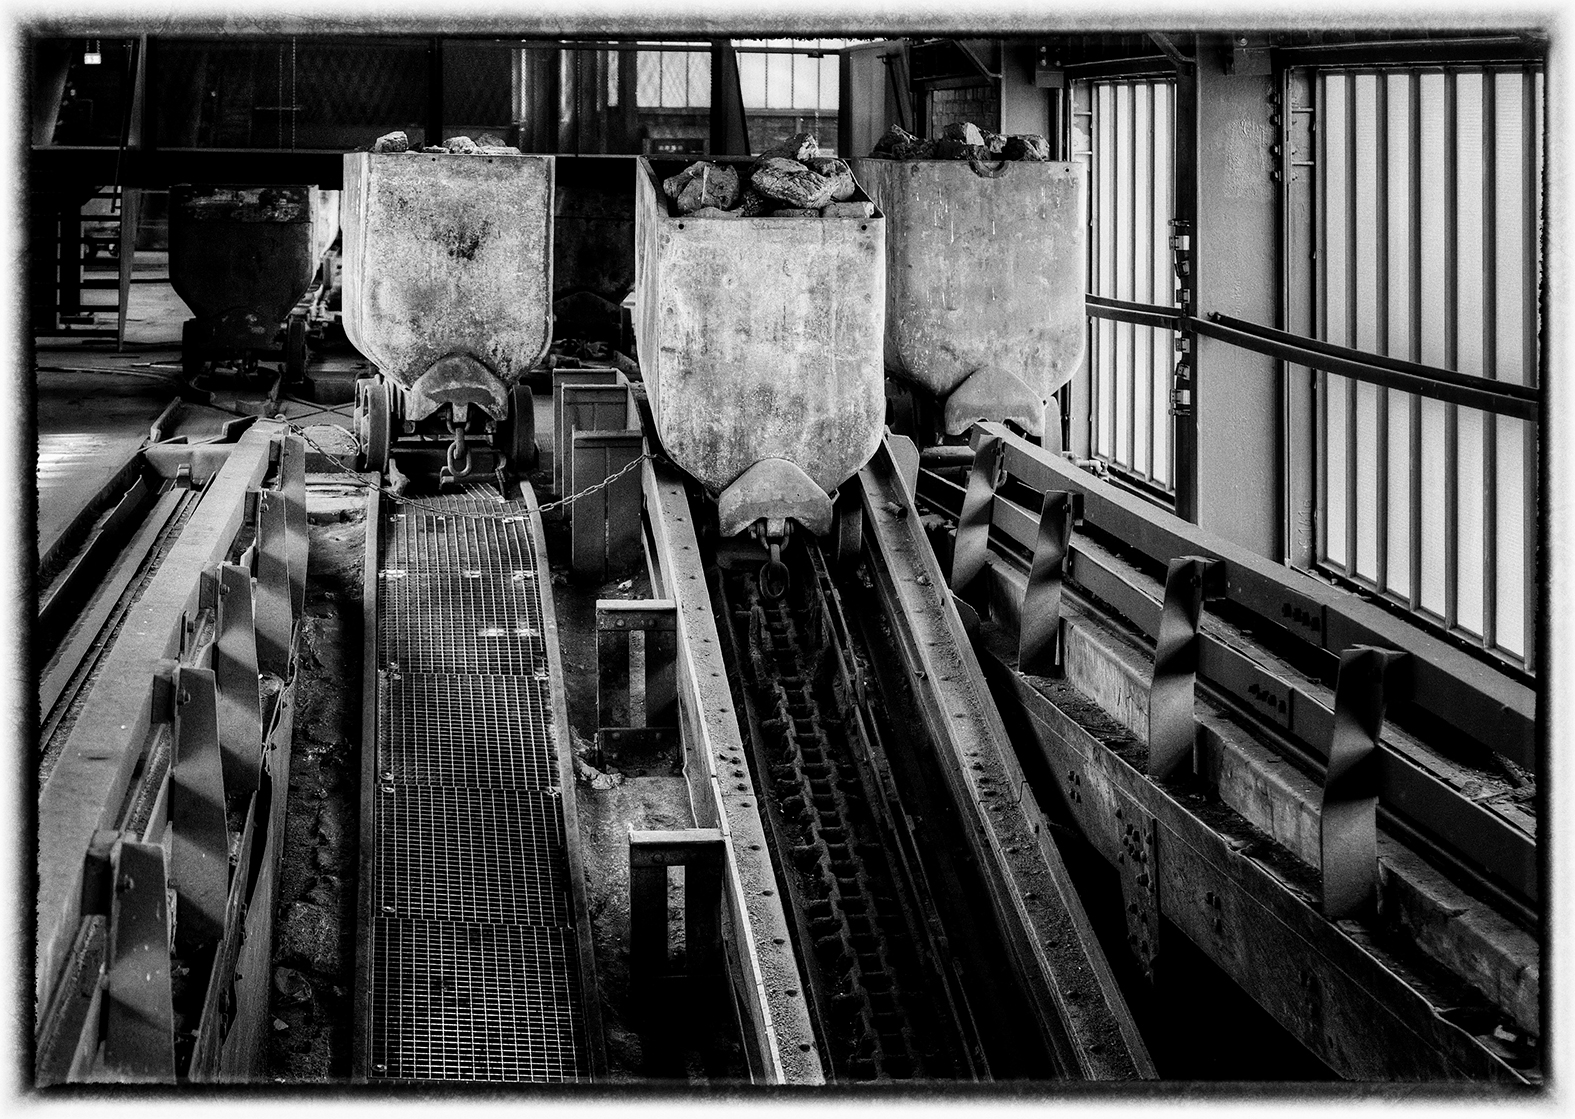 023 Zeche Zollverein.jpg